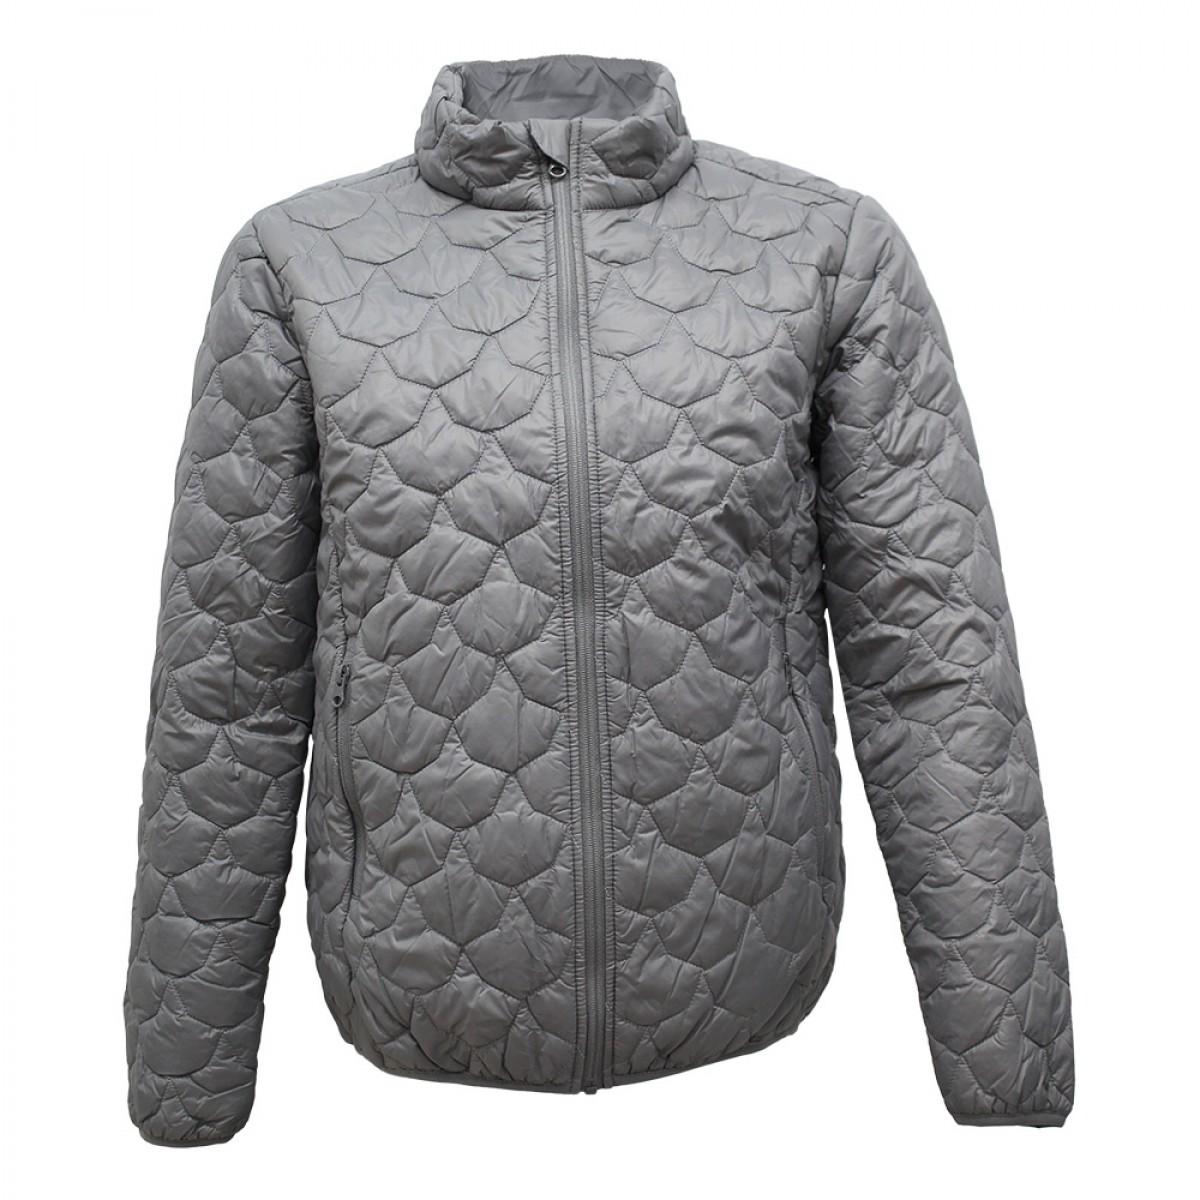 men-polyfiber-jacket-without-hoodie-kpj05911-10a